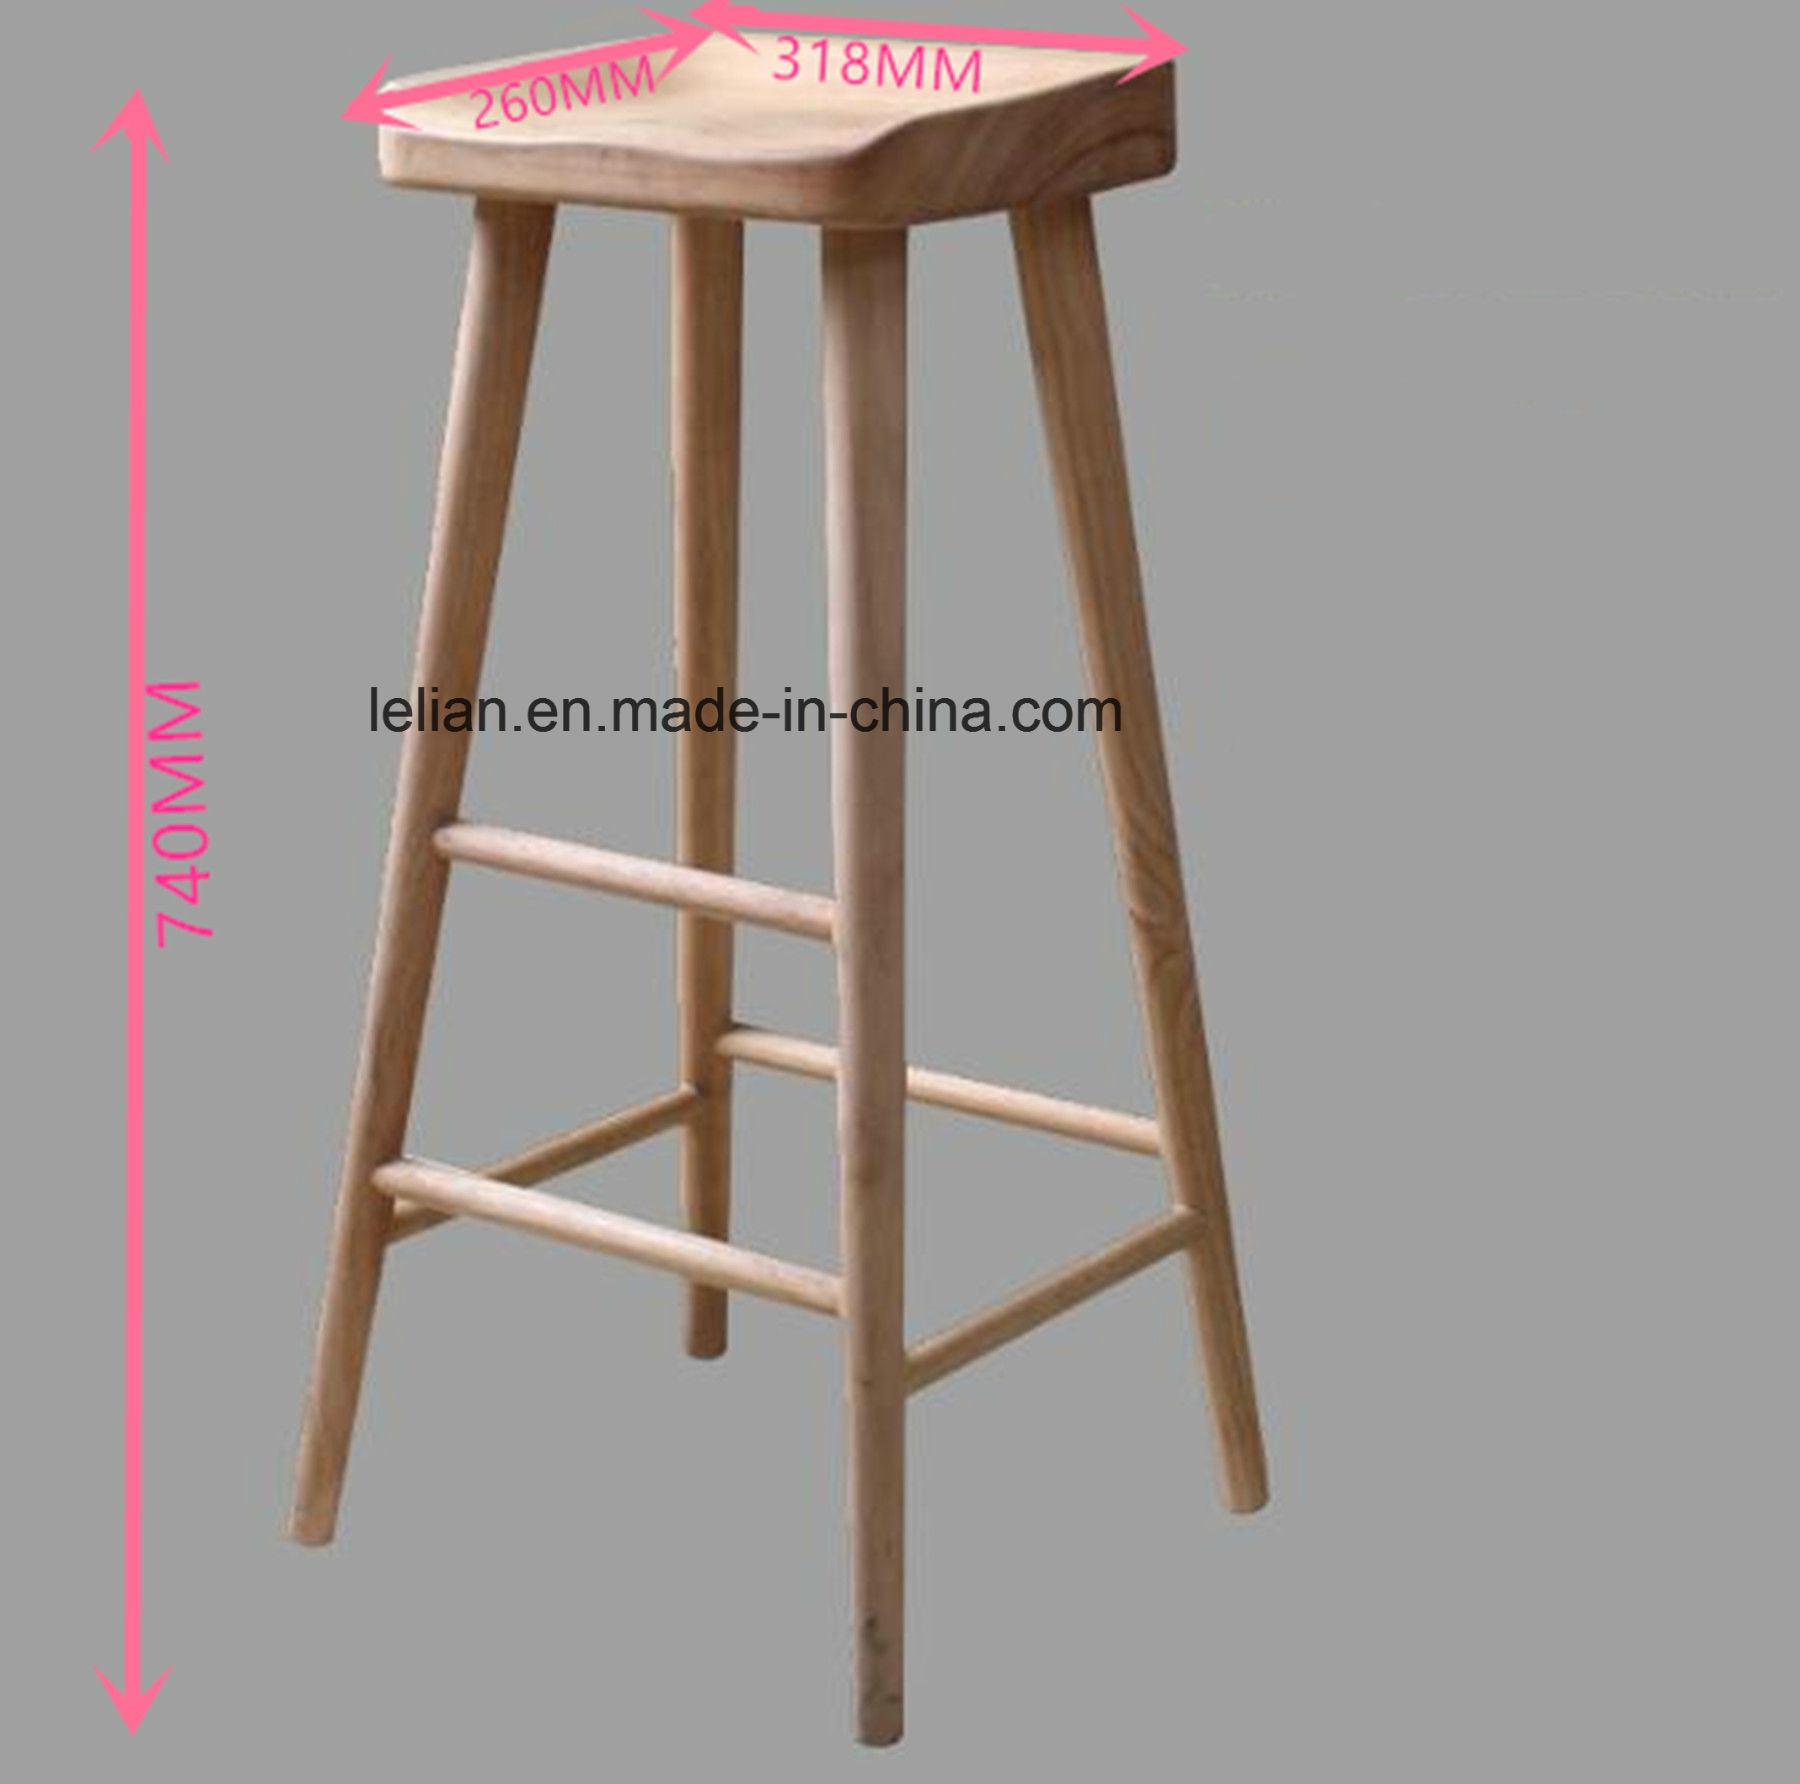 Commercial Oak Wood Bar Stool for Bar Furniture (LL-BC060)